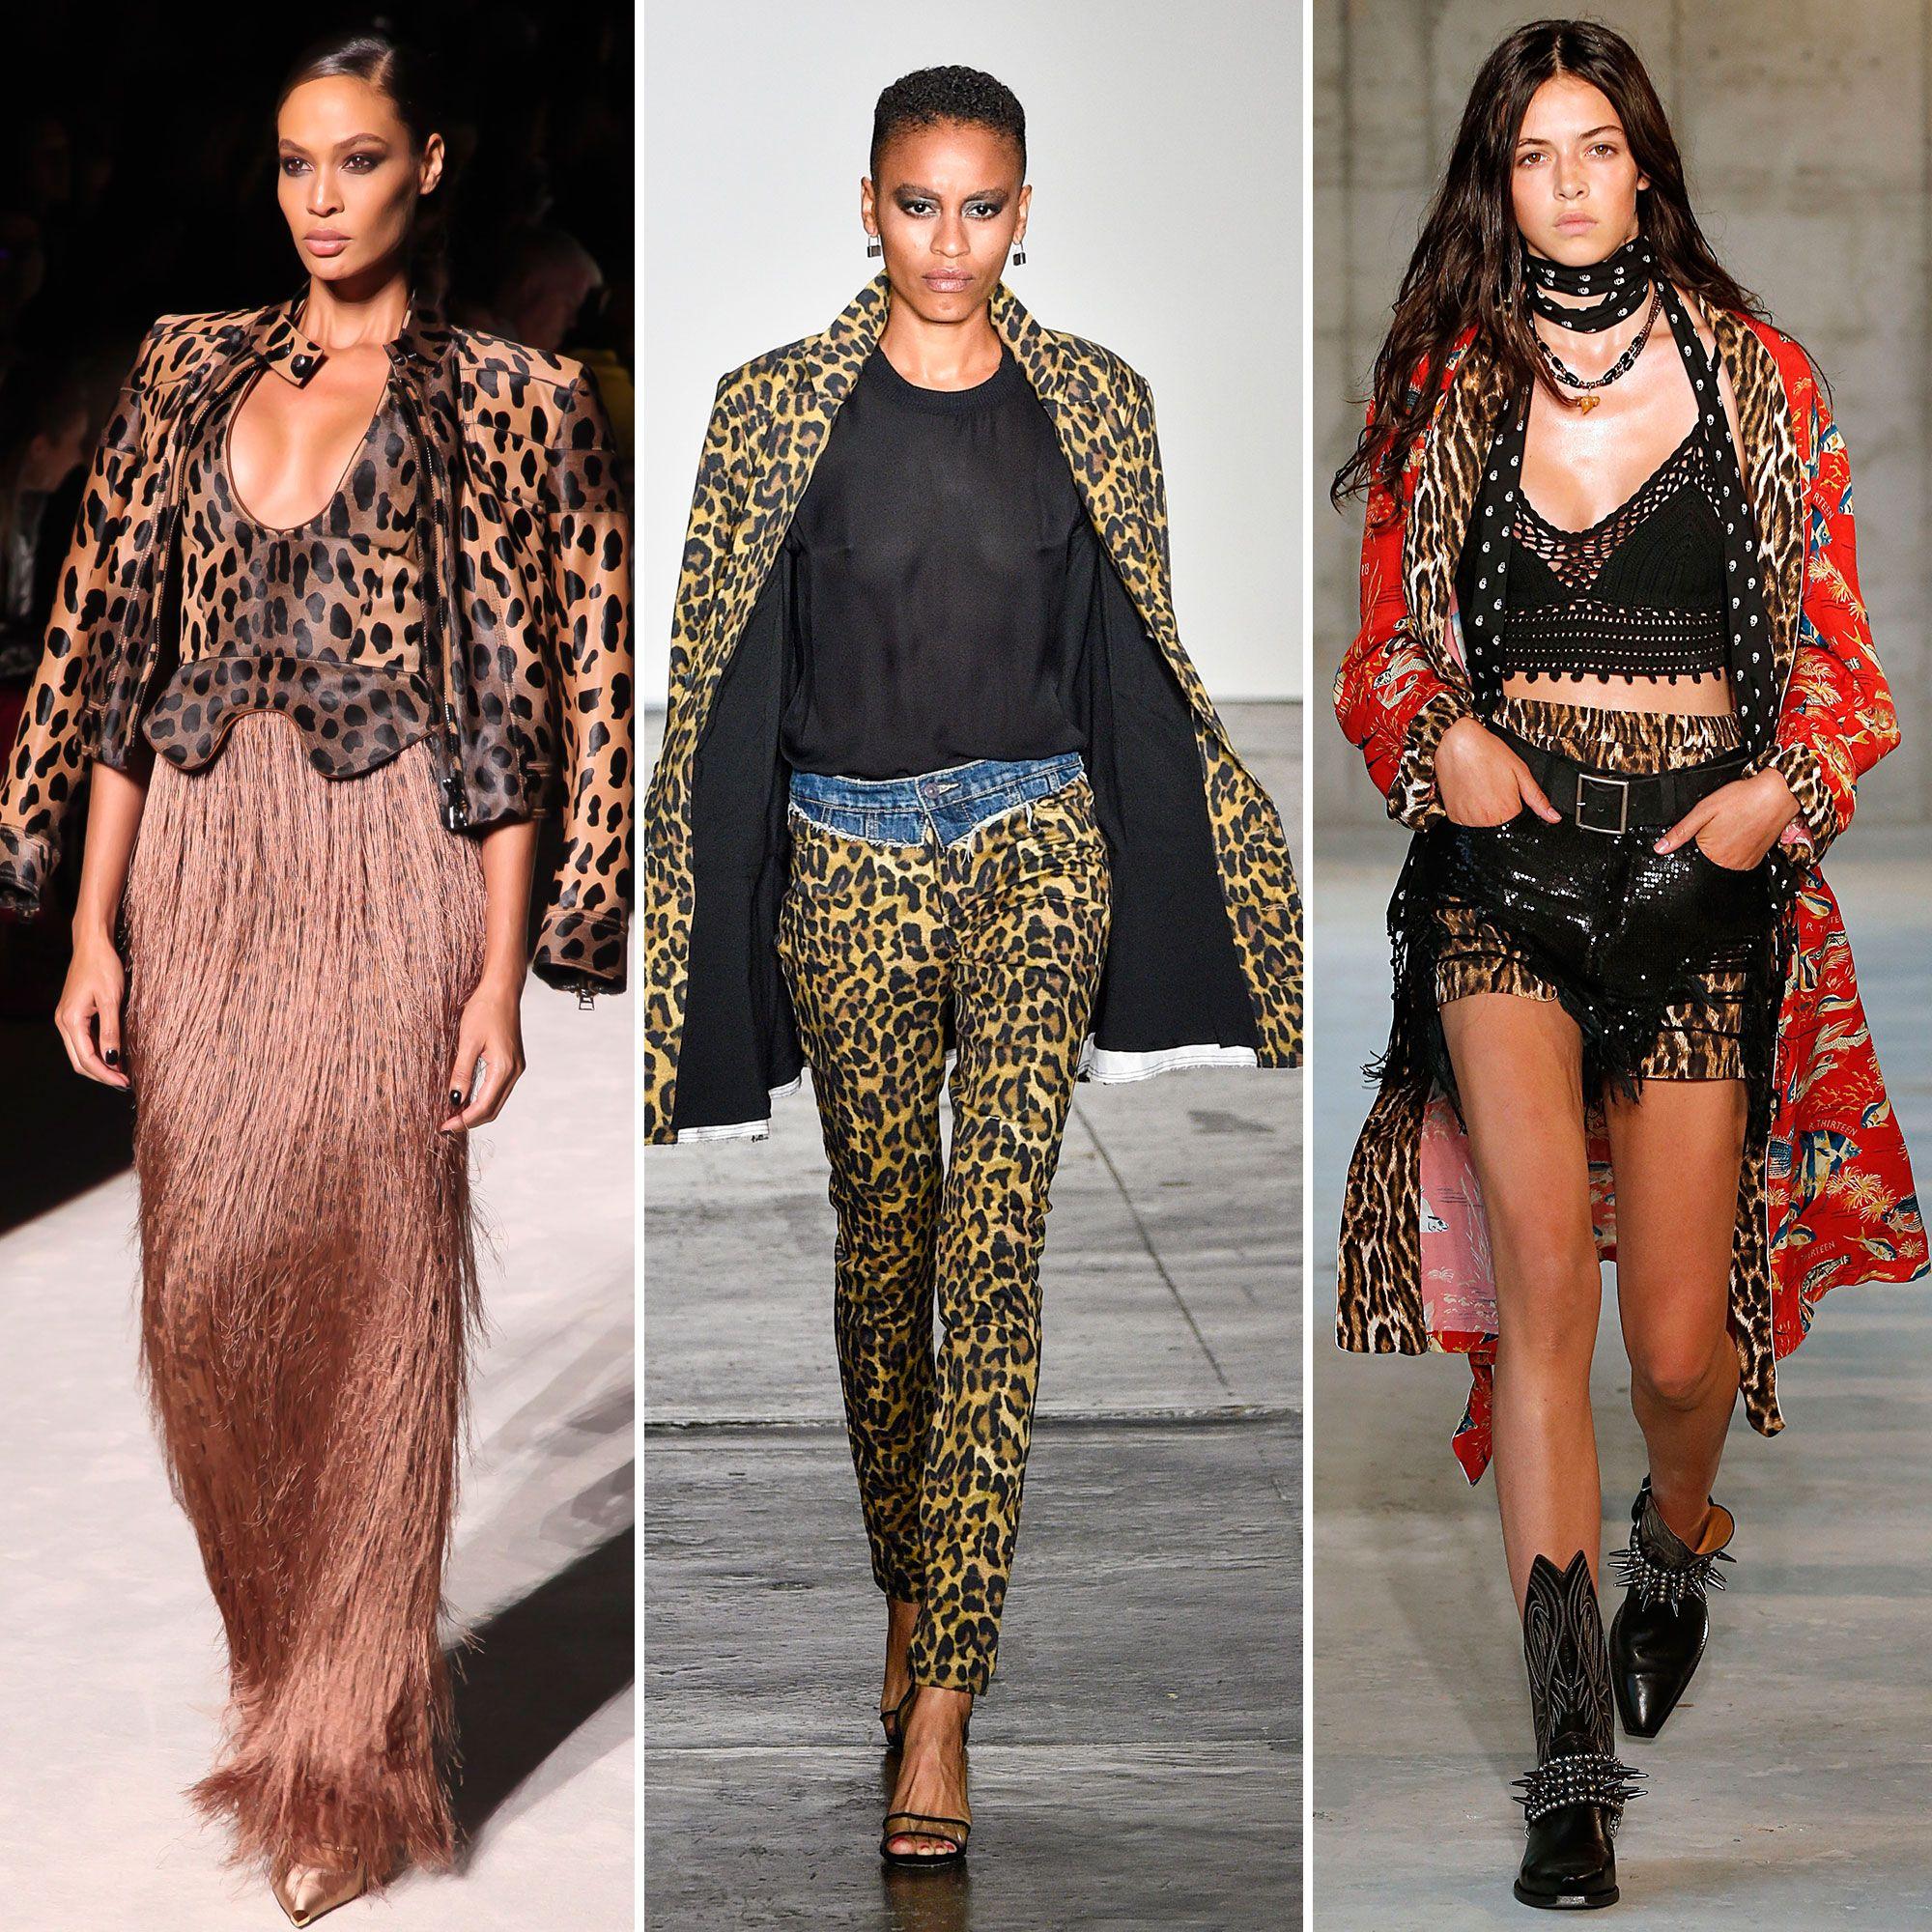 Spring/summer fashion trends 2019 - animal print